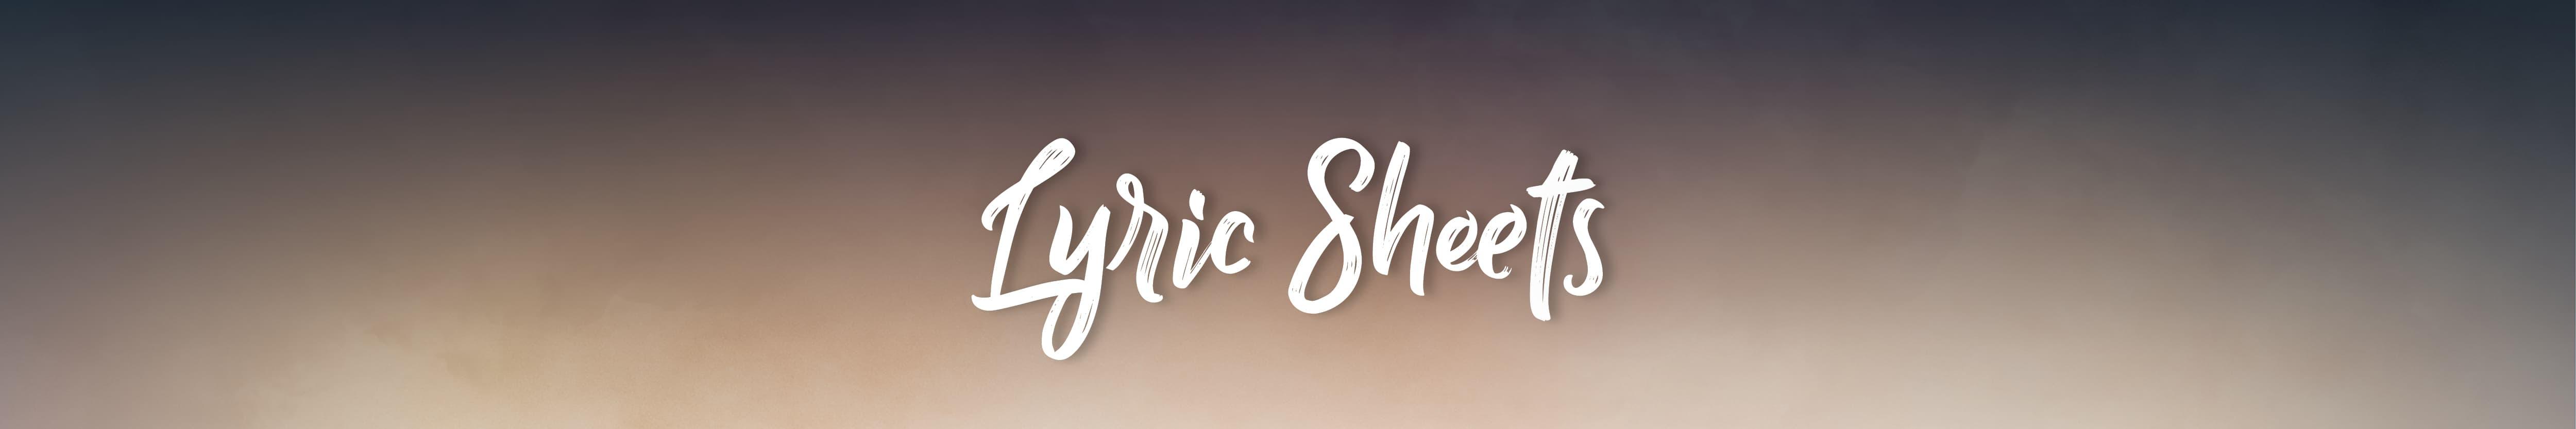 SCH_Shania_WebGraphics-PortalHeader_18_LyricSheets